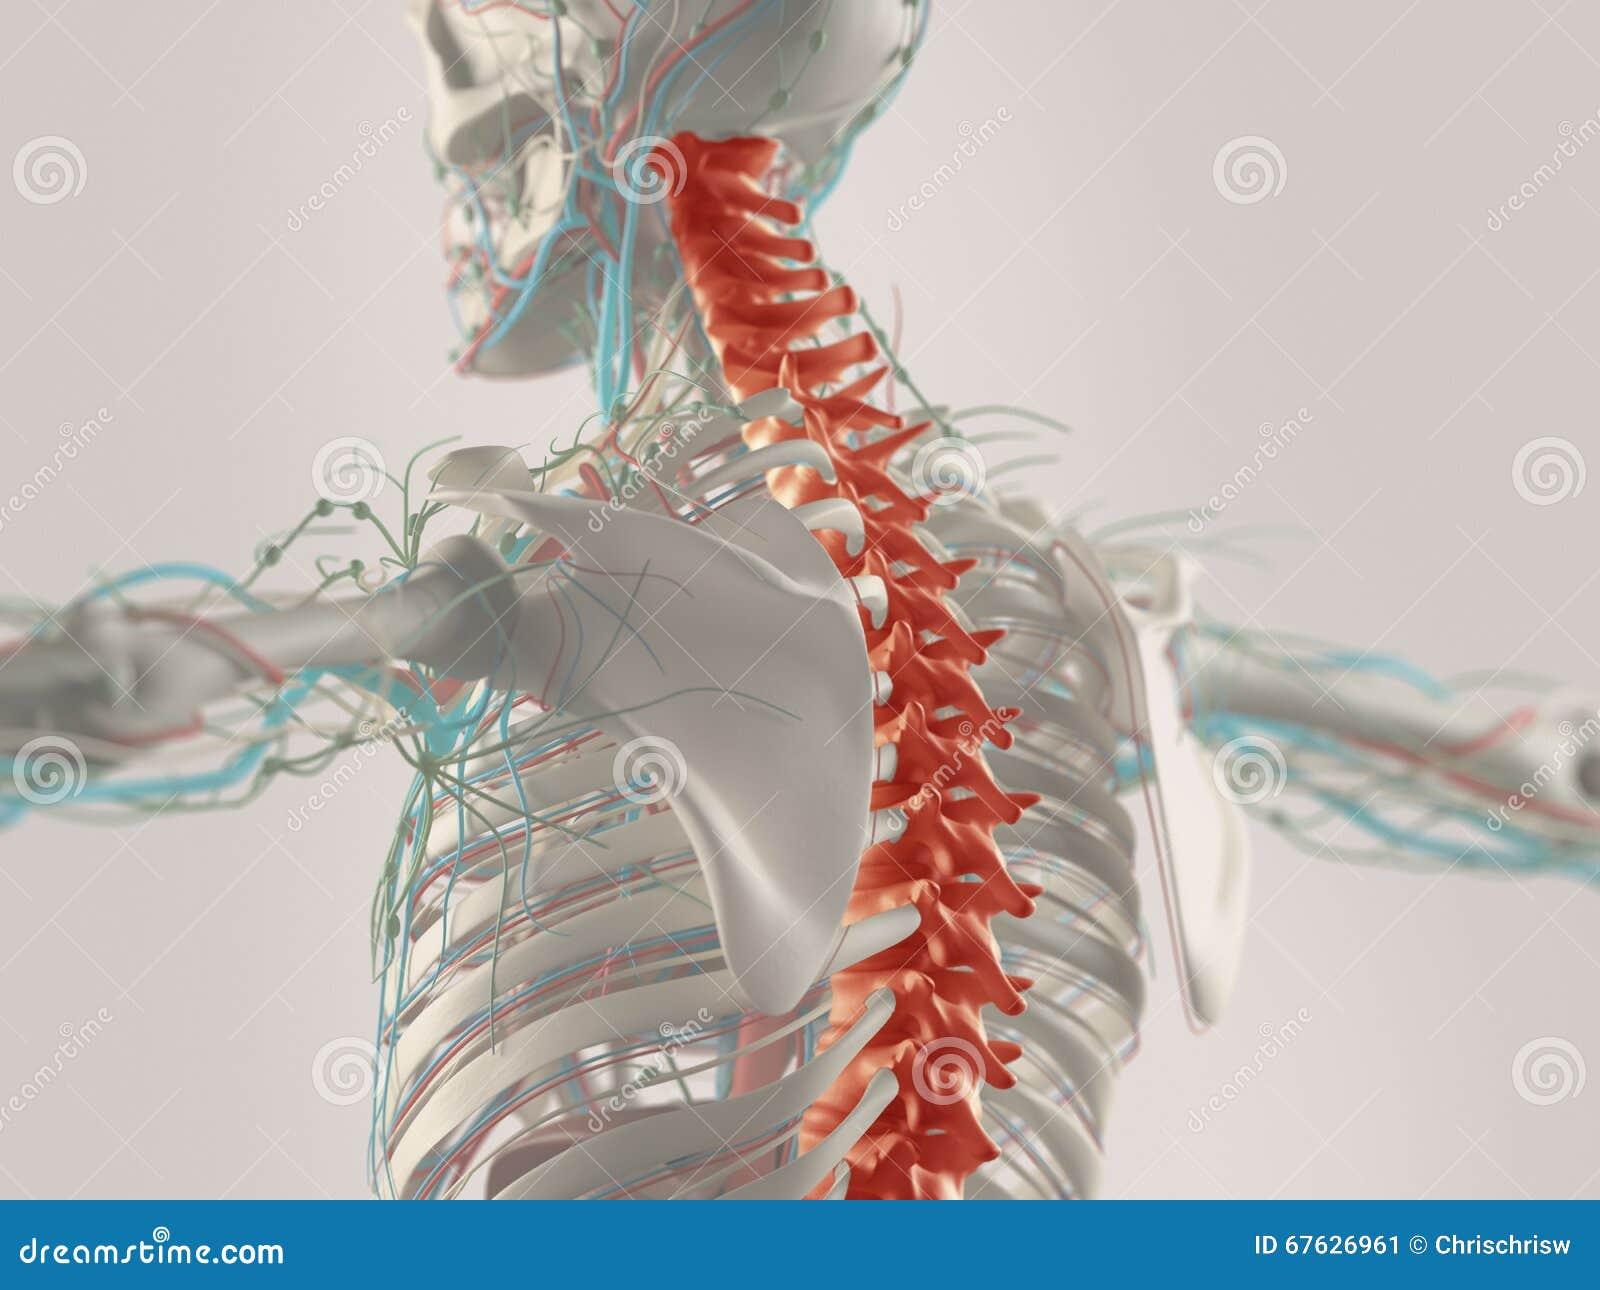 Human Anatomy In 3d Stock Image Image Of Drawn Vertebrae 67626961